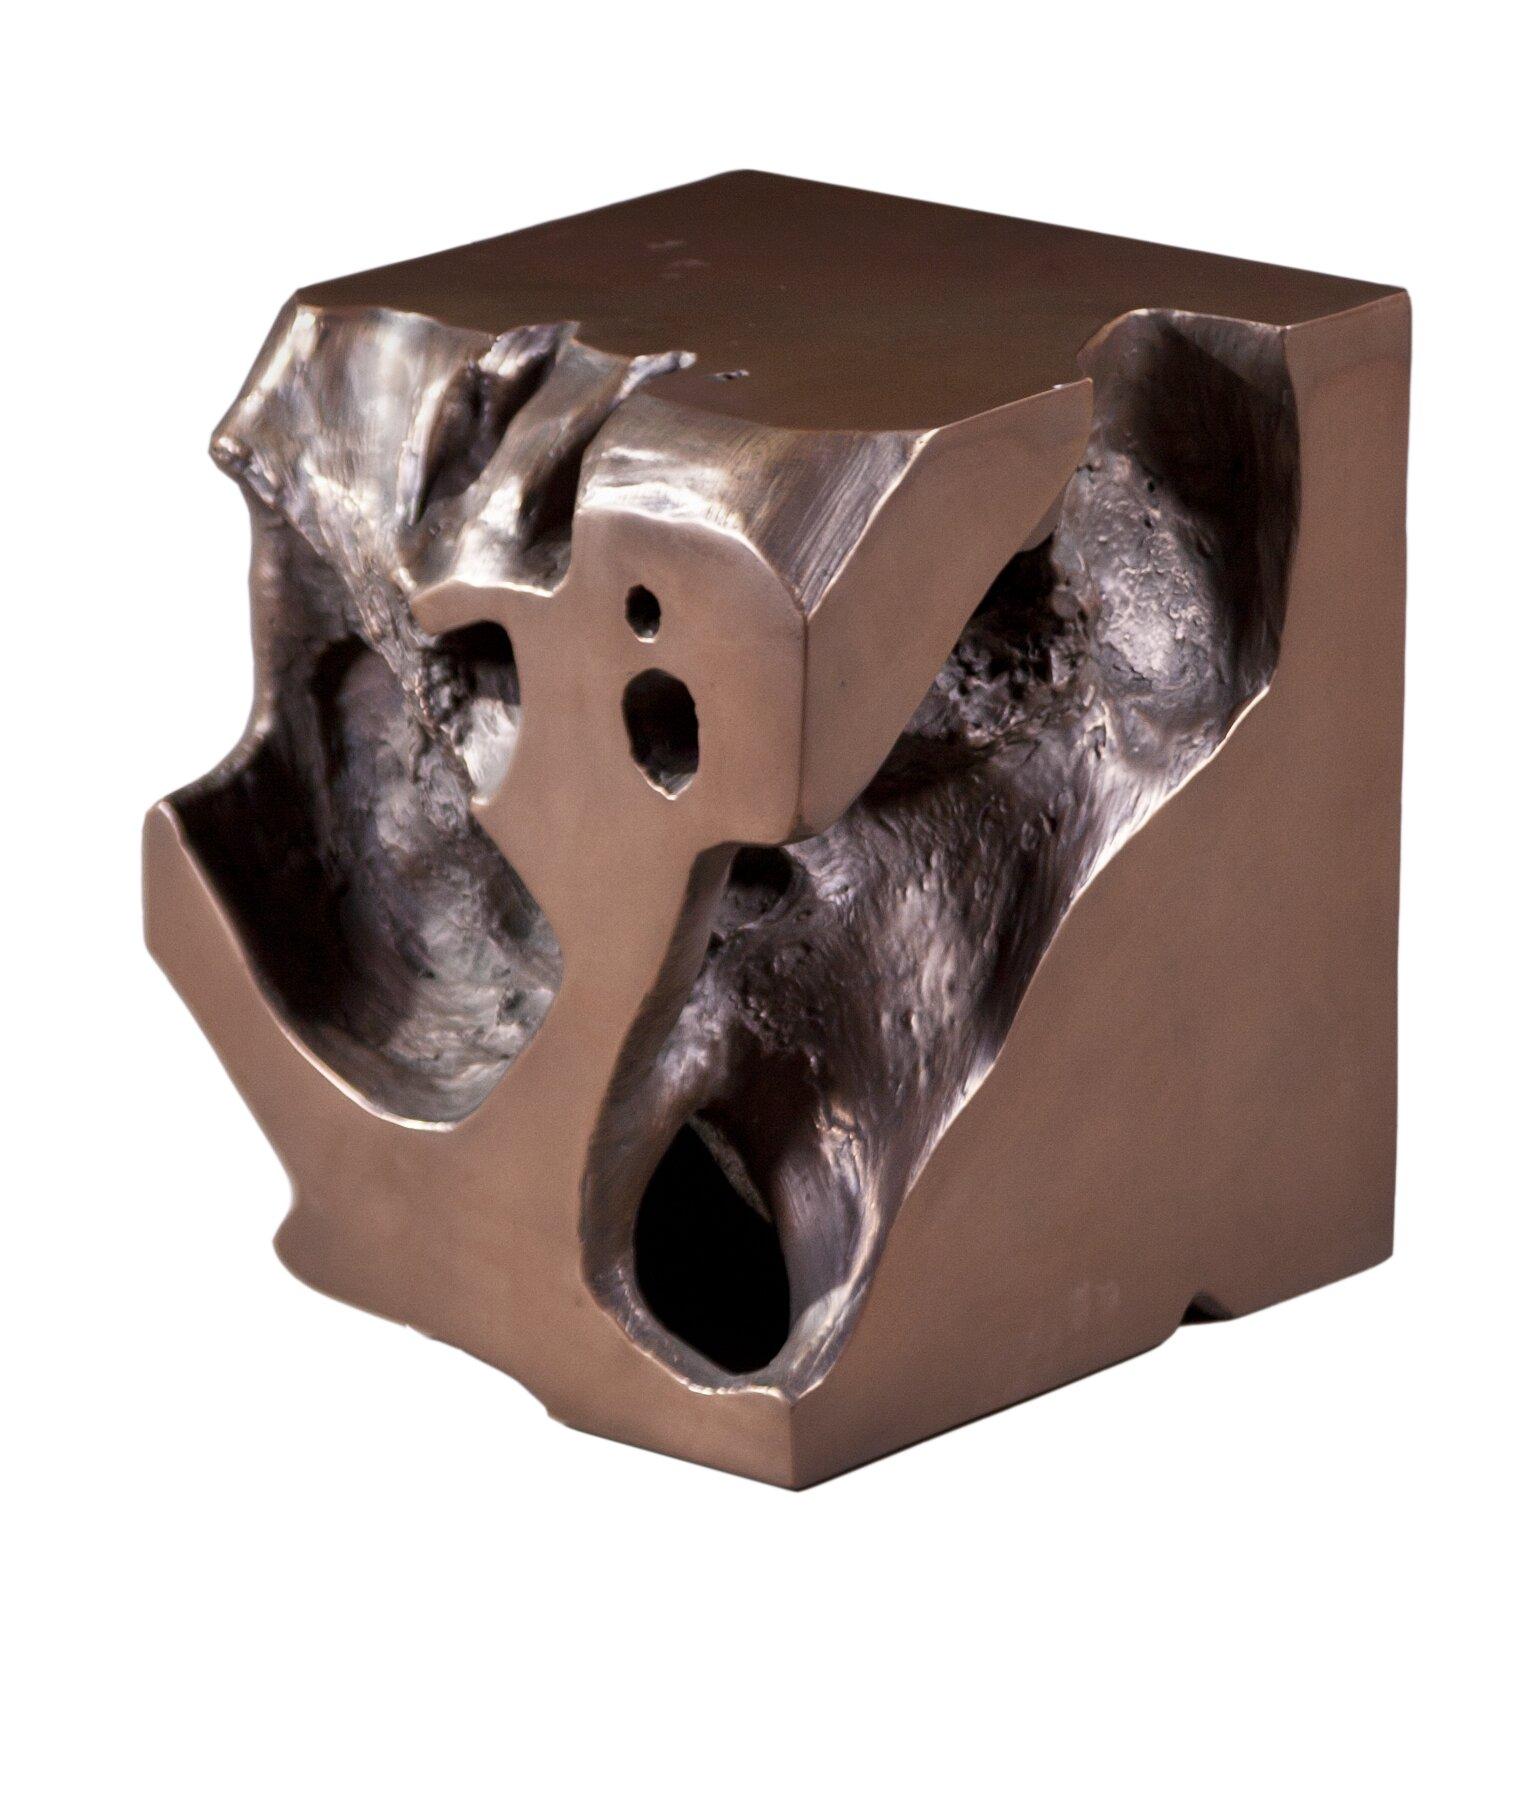 Phillips Collection Freeform Plastic Accent Stool Wayfair